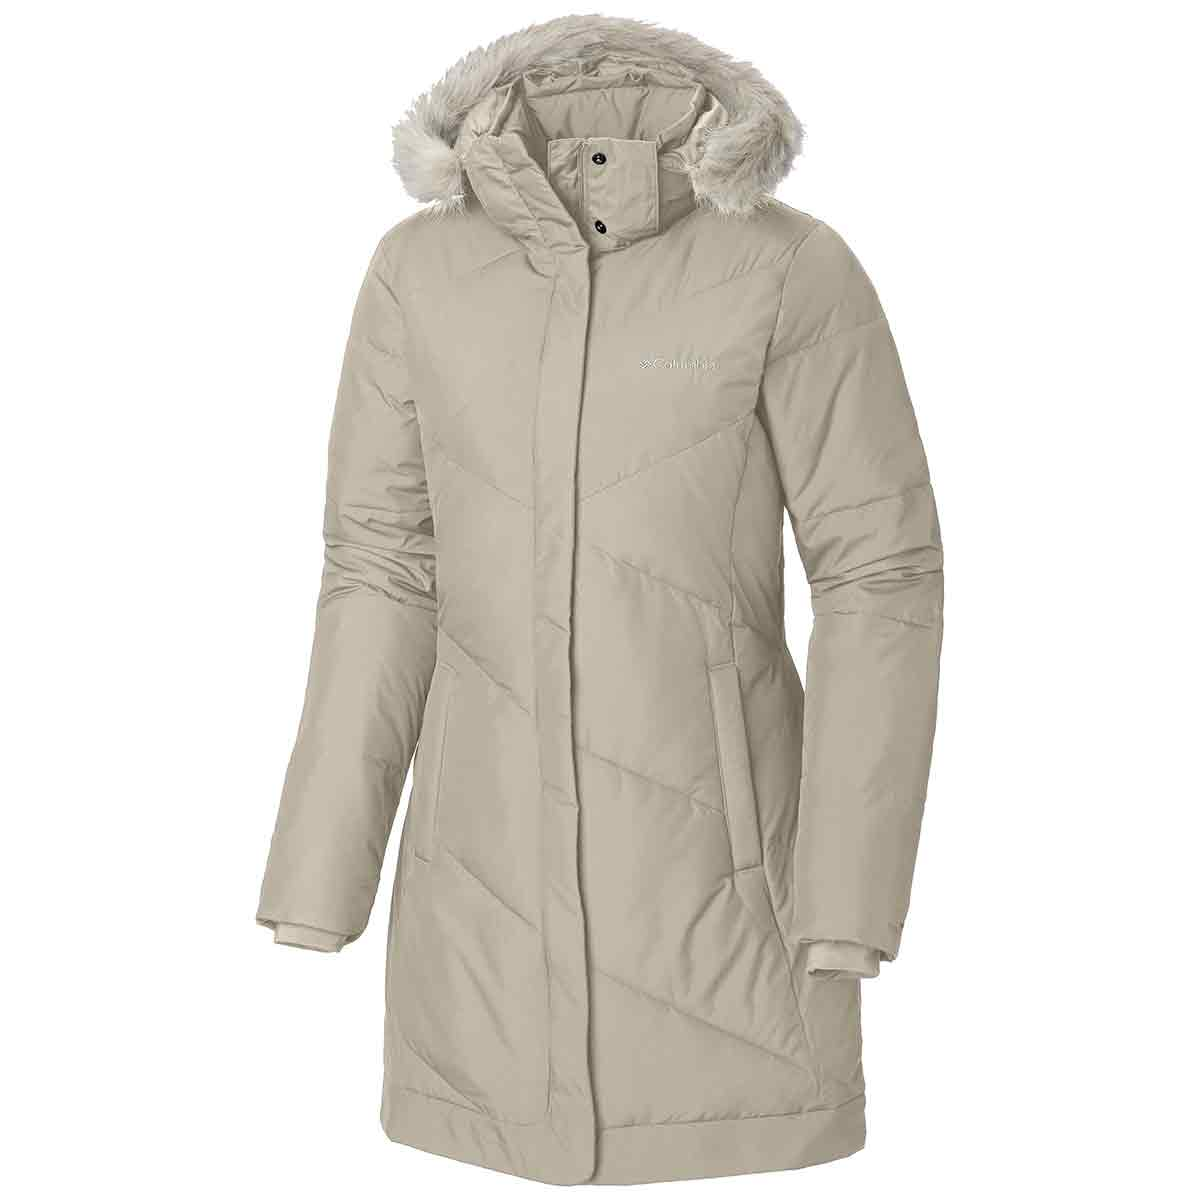 Columbia Women's Snow Eclipse Mid Jacket - White, L